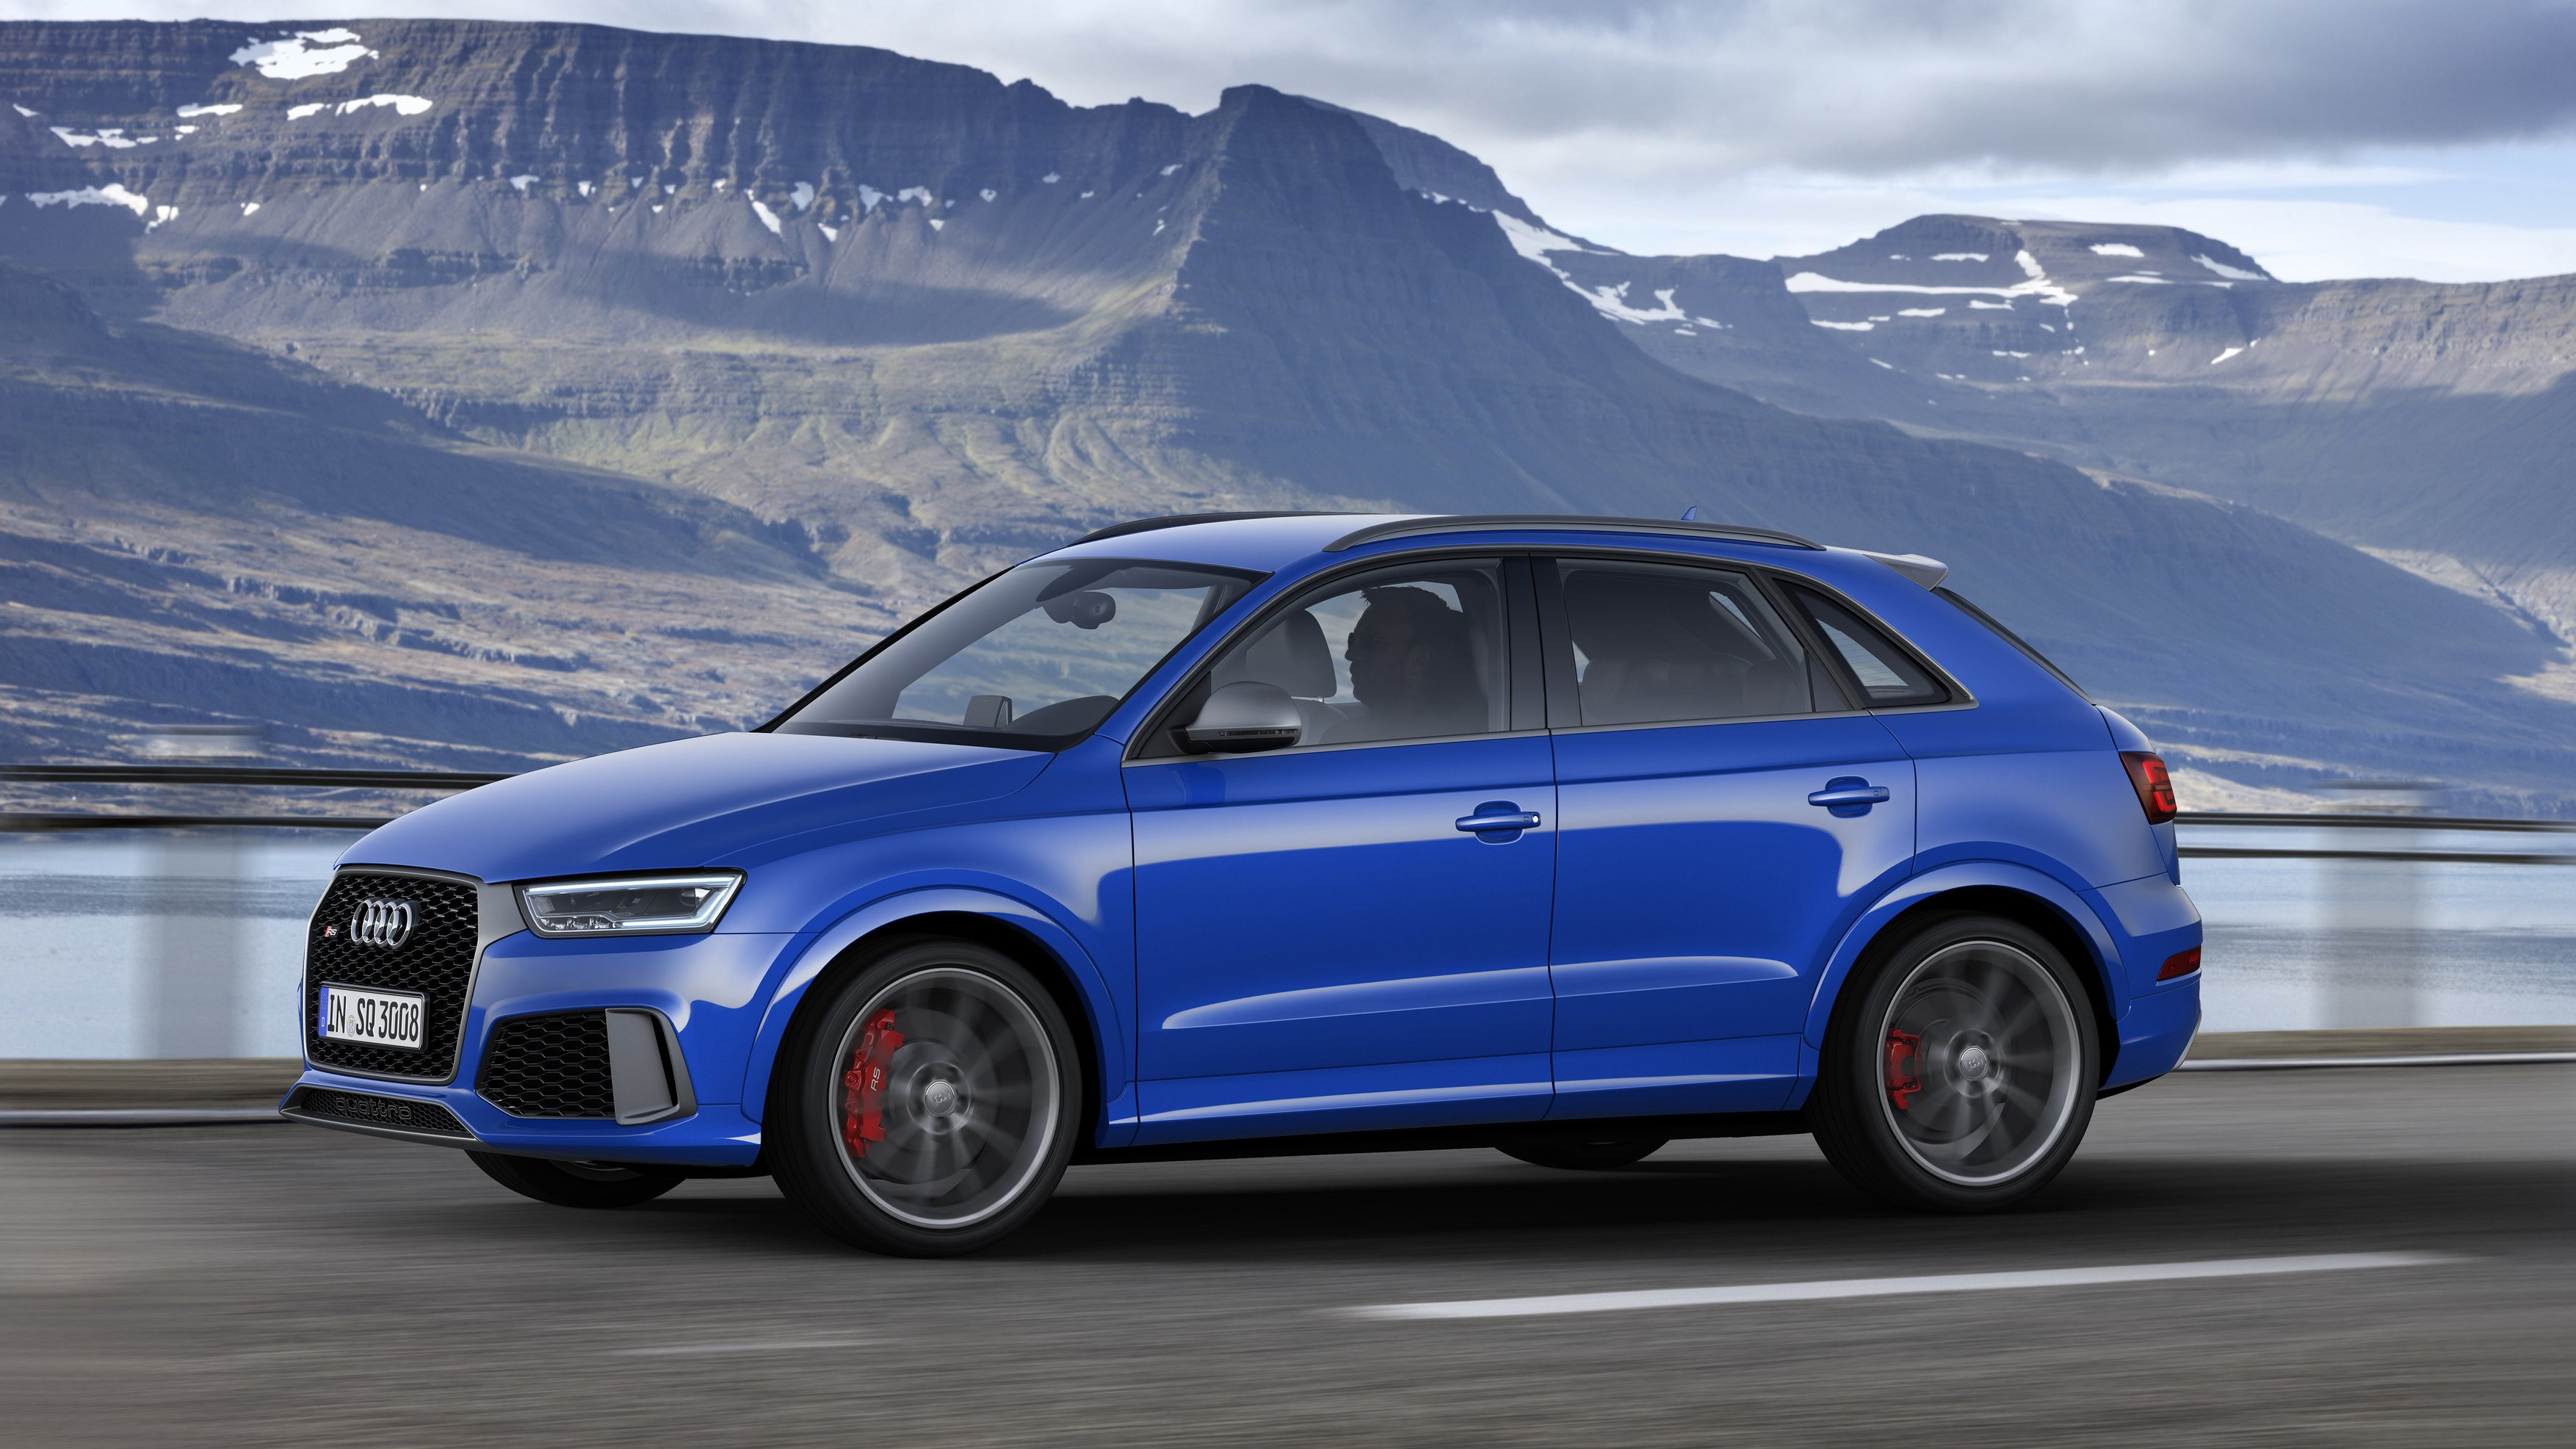 New Audi Cars for Sale in Australia  carsalescomau